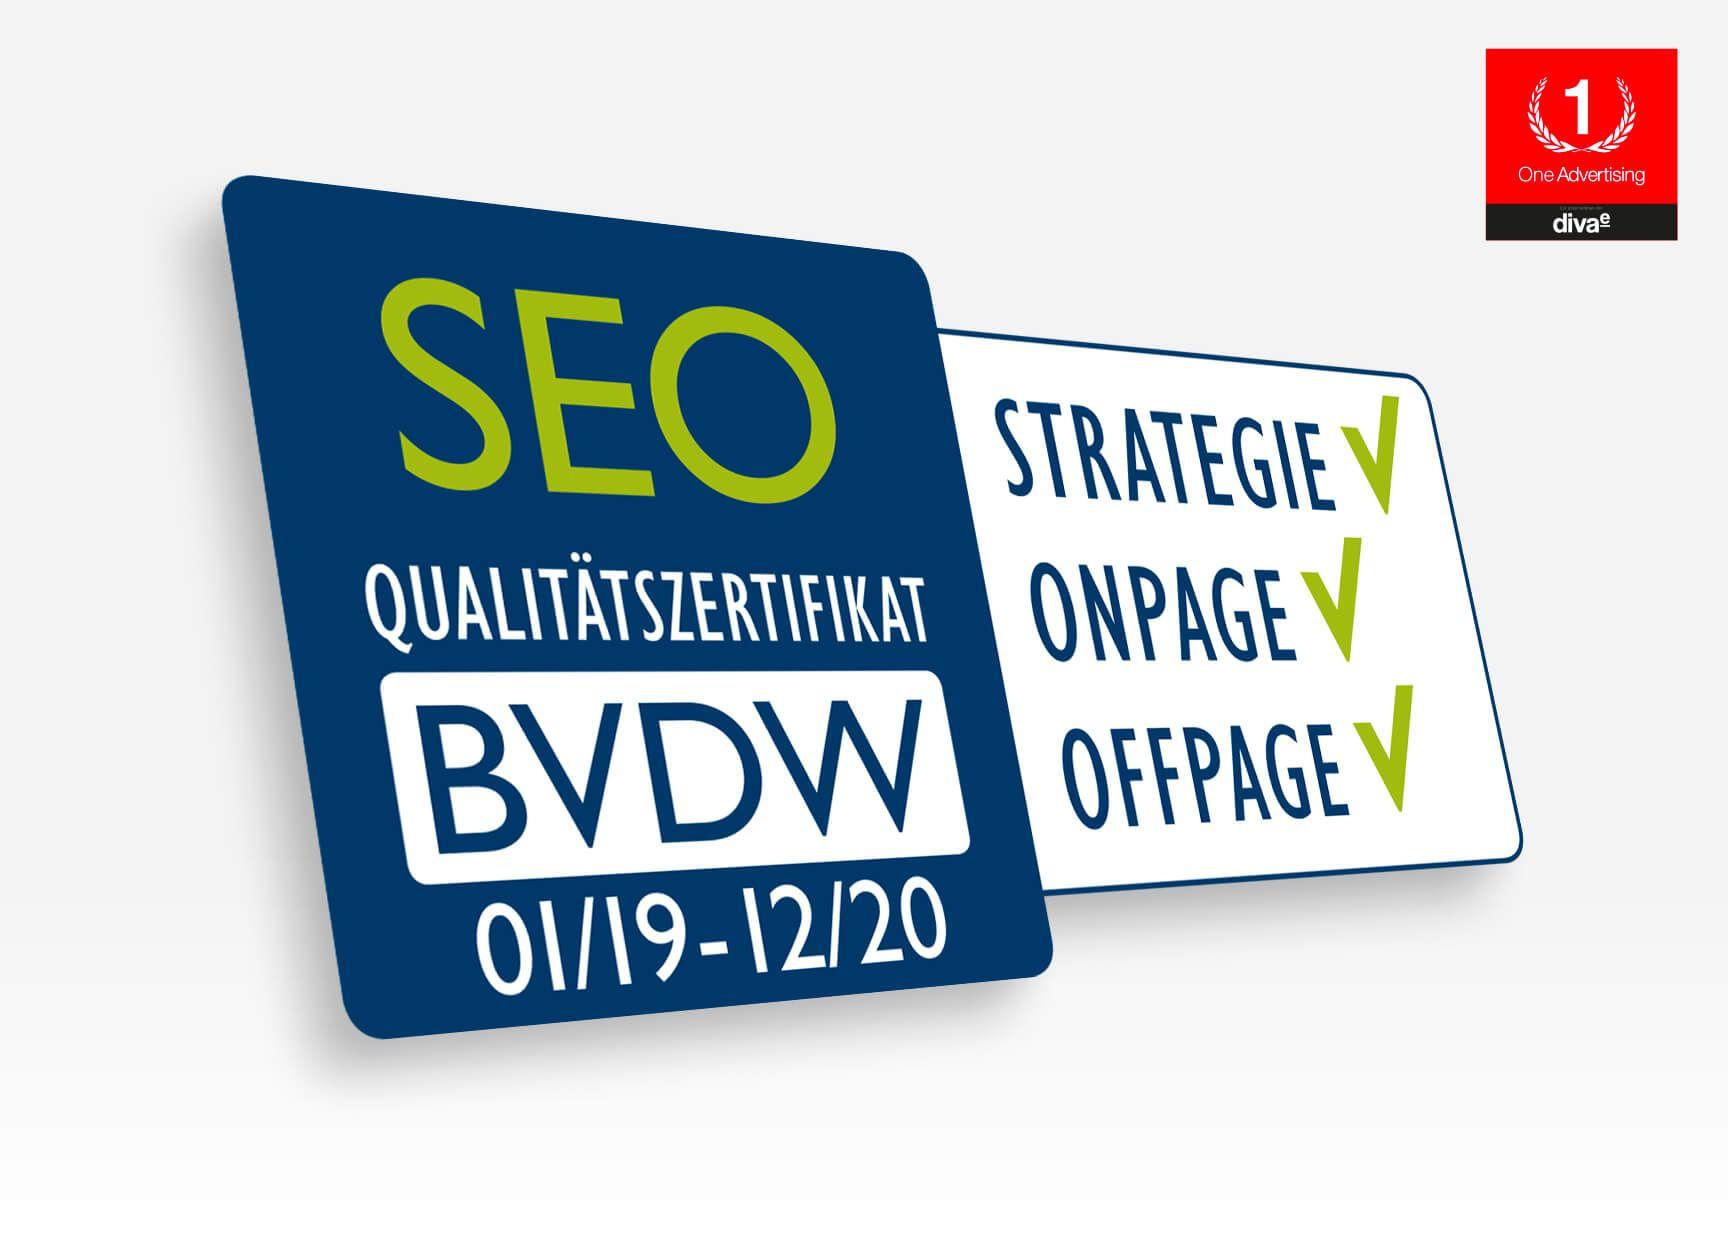 One Advertising erhält erneut SEO-Qualitätszertifikat des BVDW